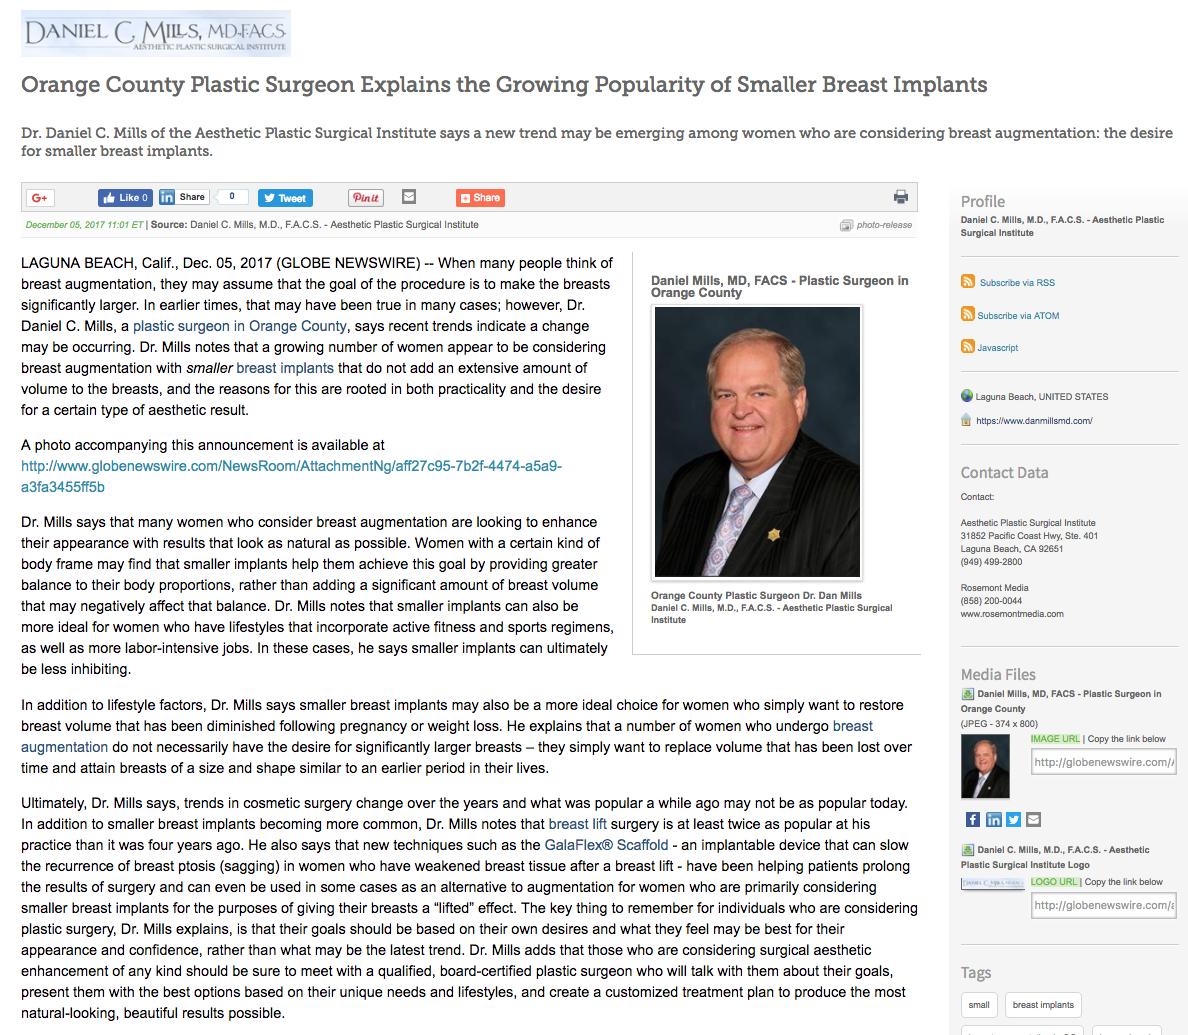 Orange County Plastic Surgeon On Popularity Of Smaller Breast Implants